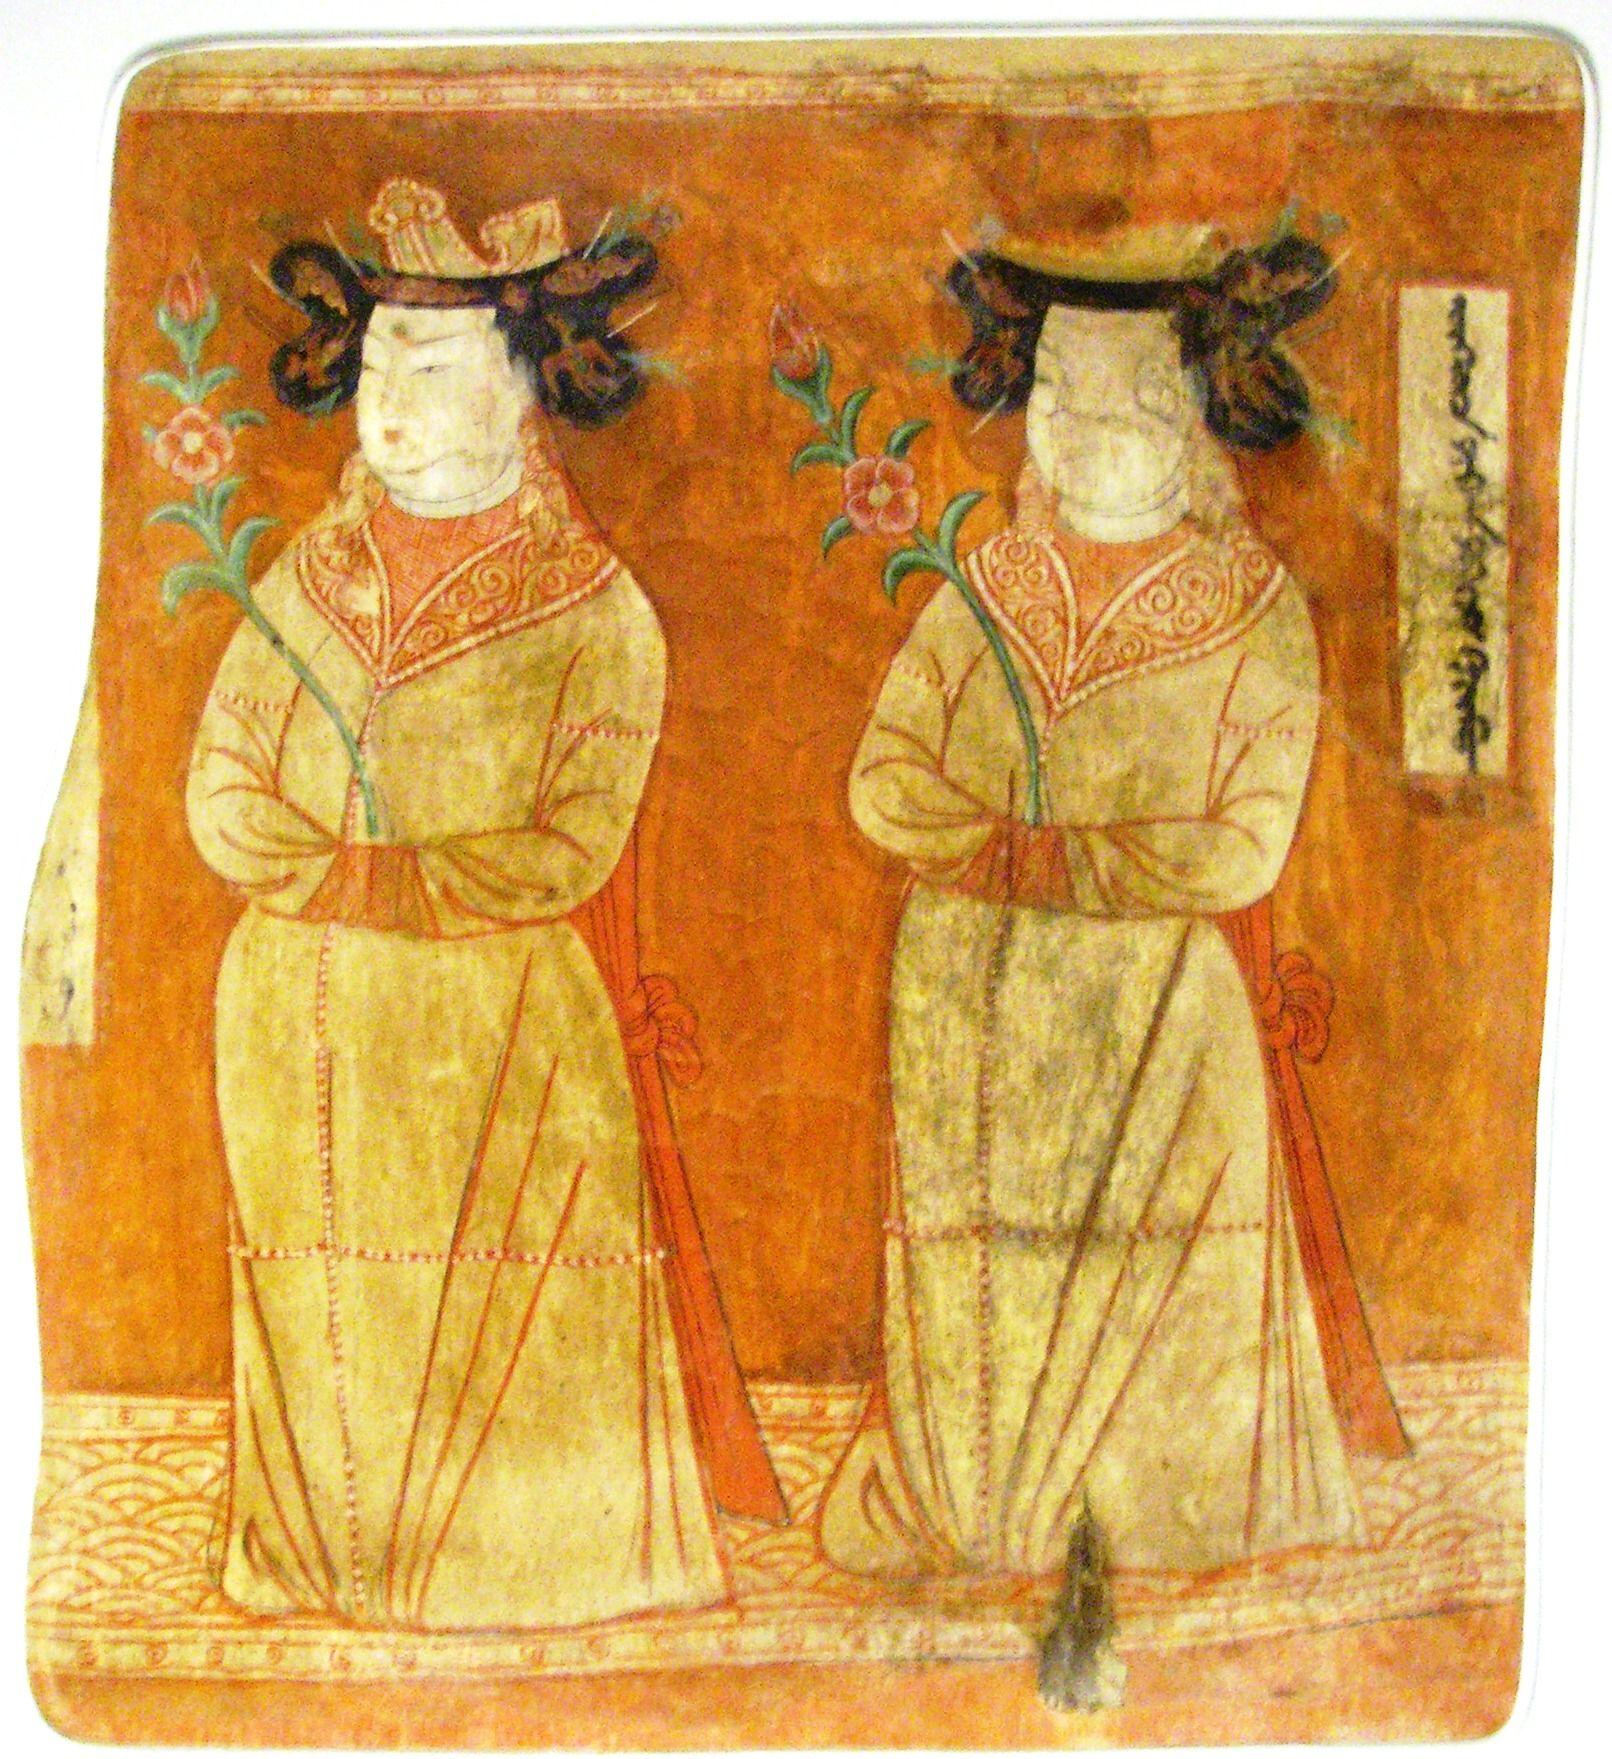 Uyghur Princesses. Bezeklik, Cave 9, 9-12th century CE, wall ...